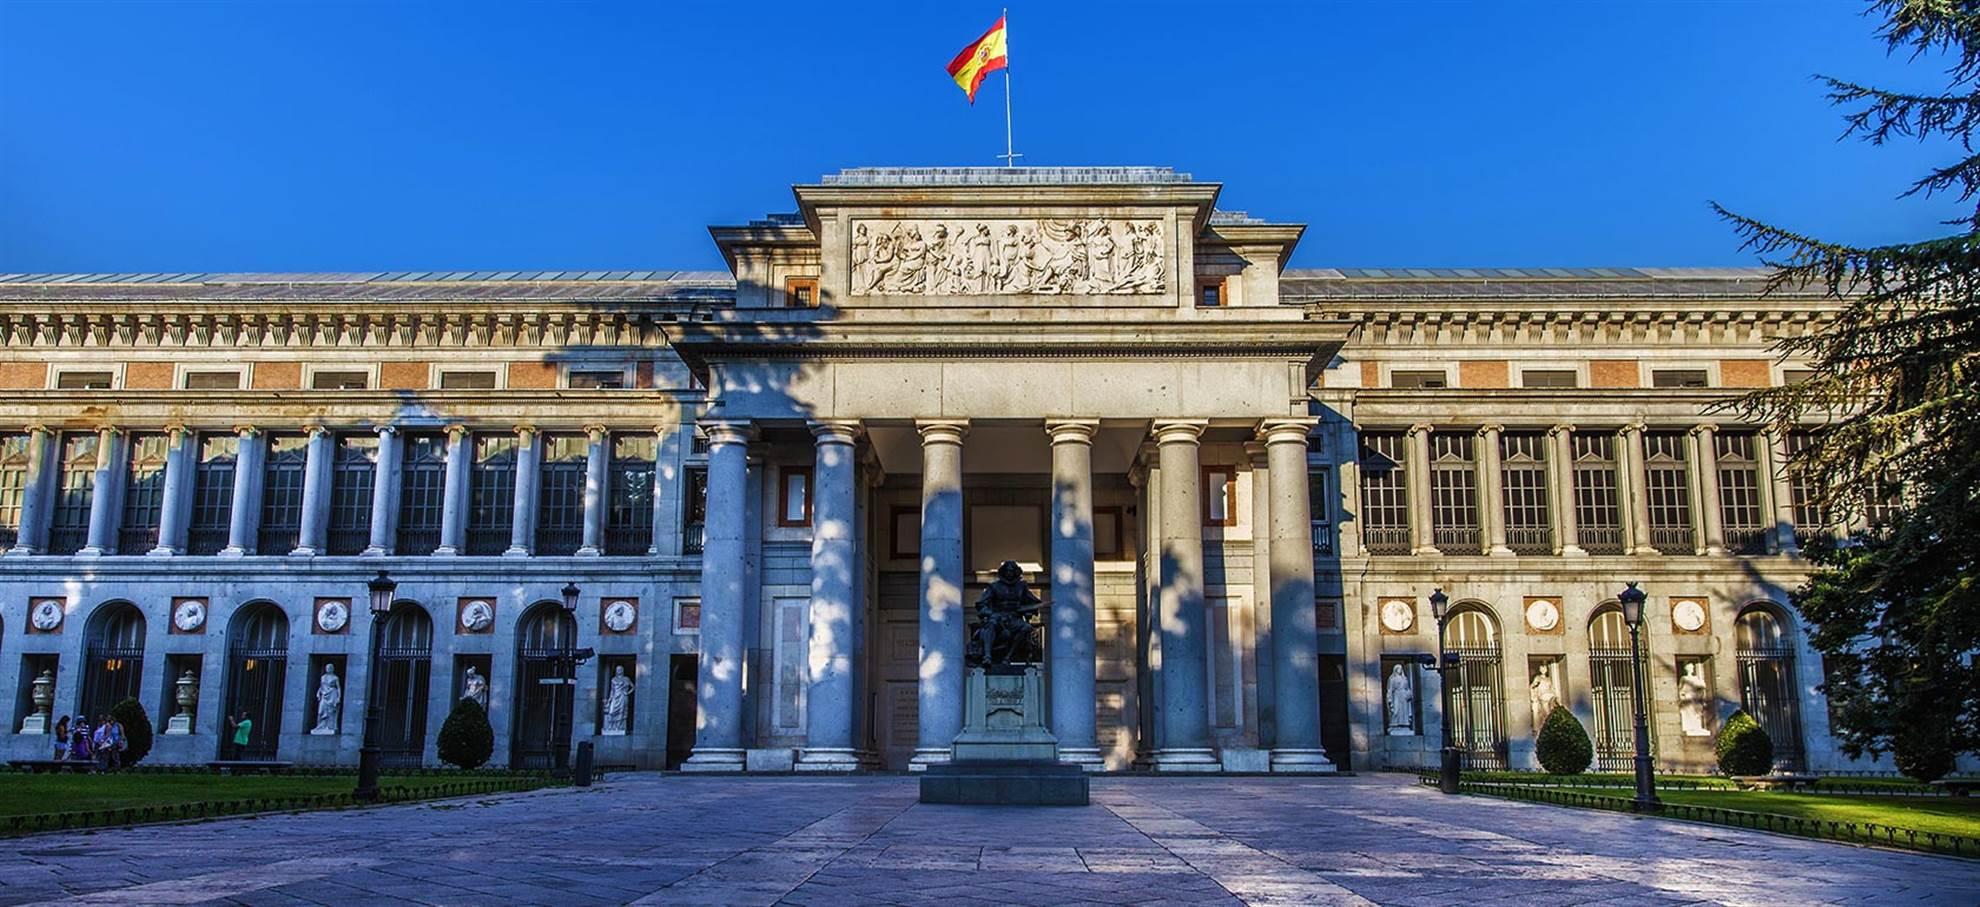 Le Musée du Prado + guide du musée(MADPRADO)